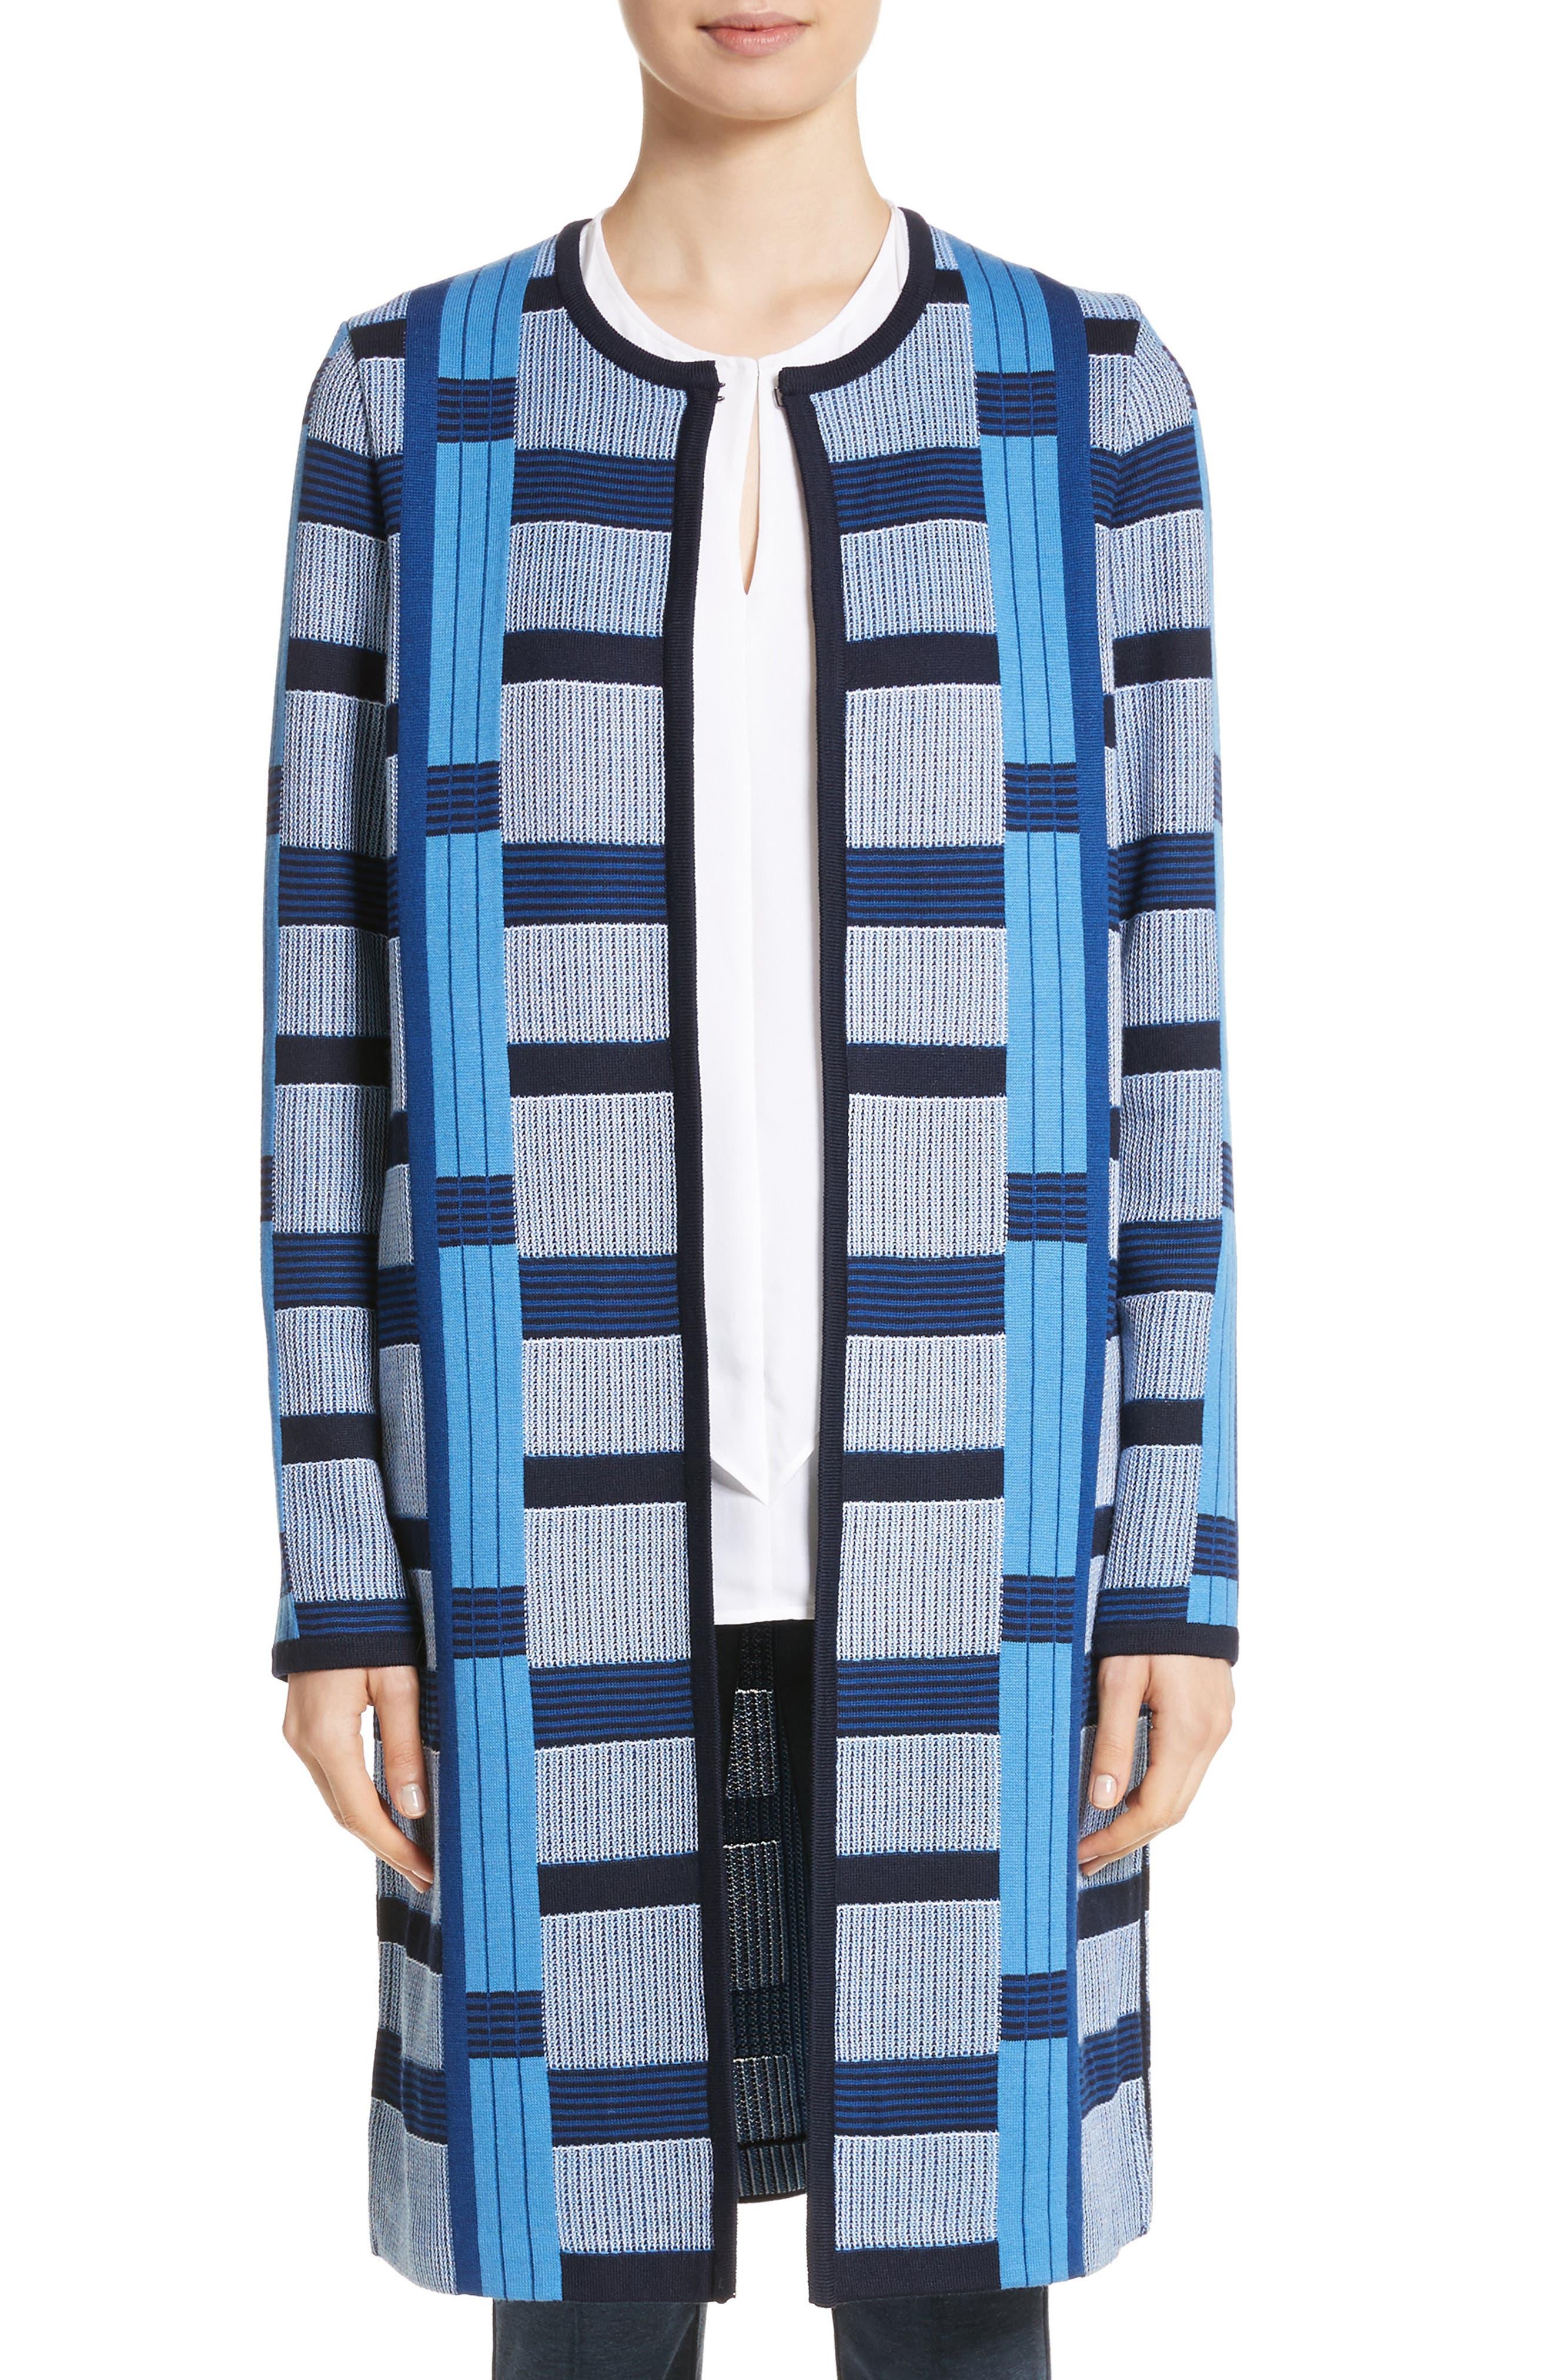 Main Image - St. John Collection Colorblock Knit Jacket